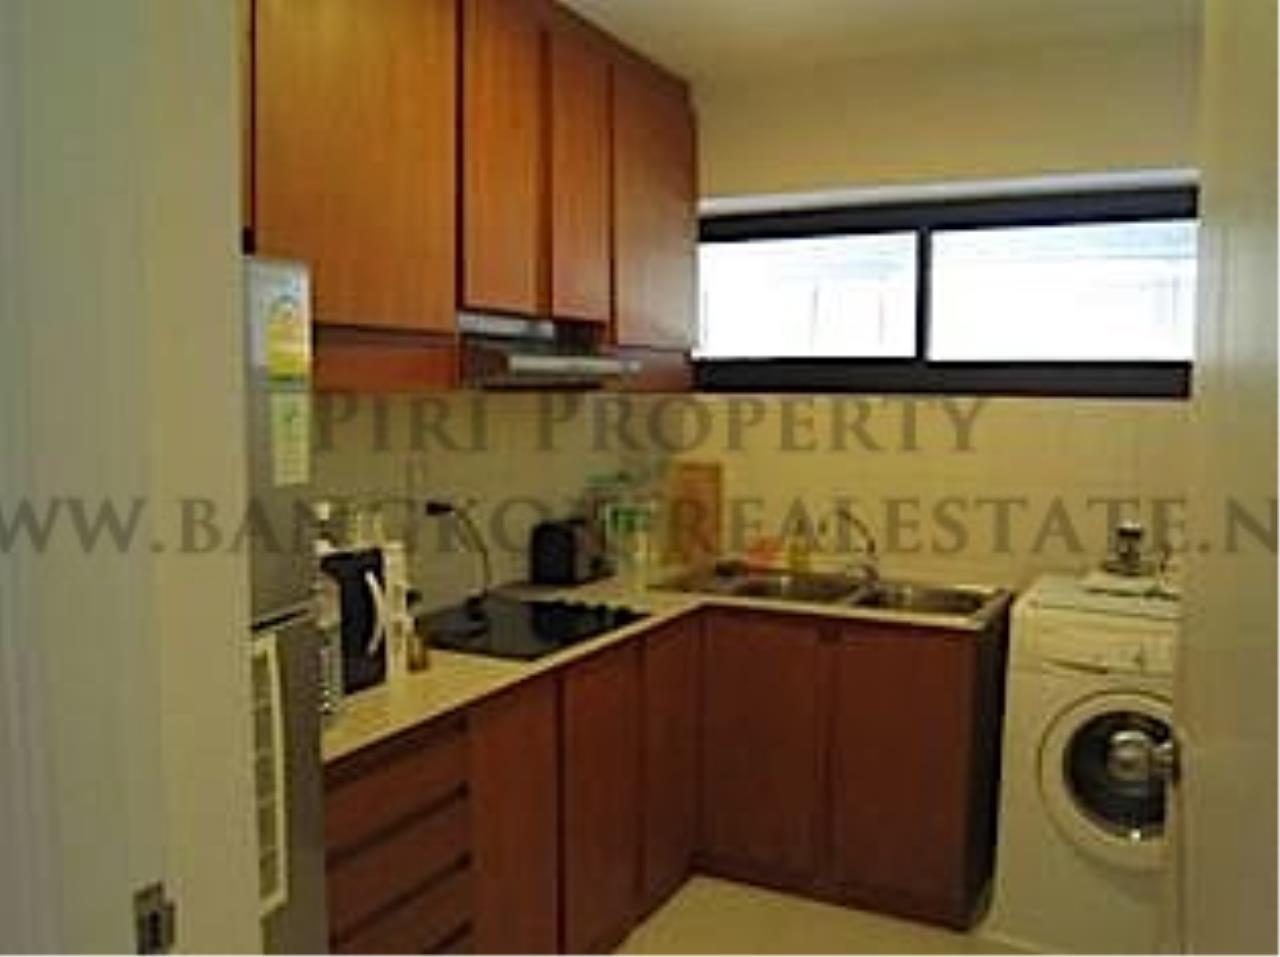 Piri Property Agency's Prime Mansion 31 - One Bedroom Unit for Rent 3